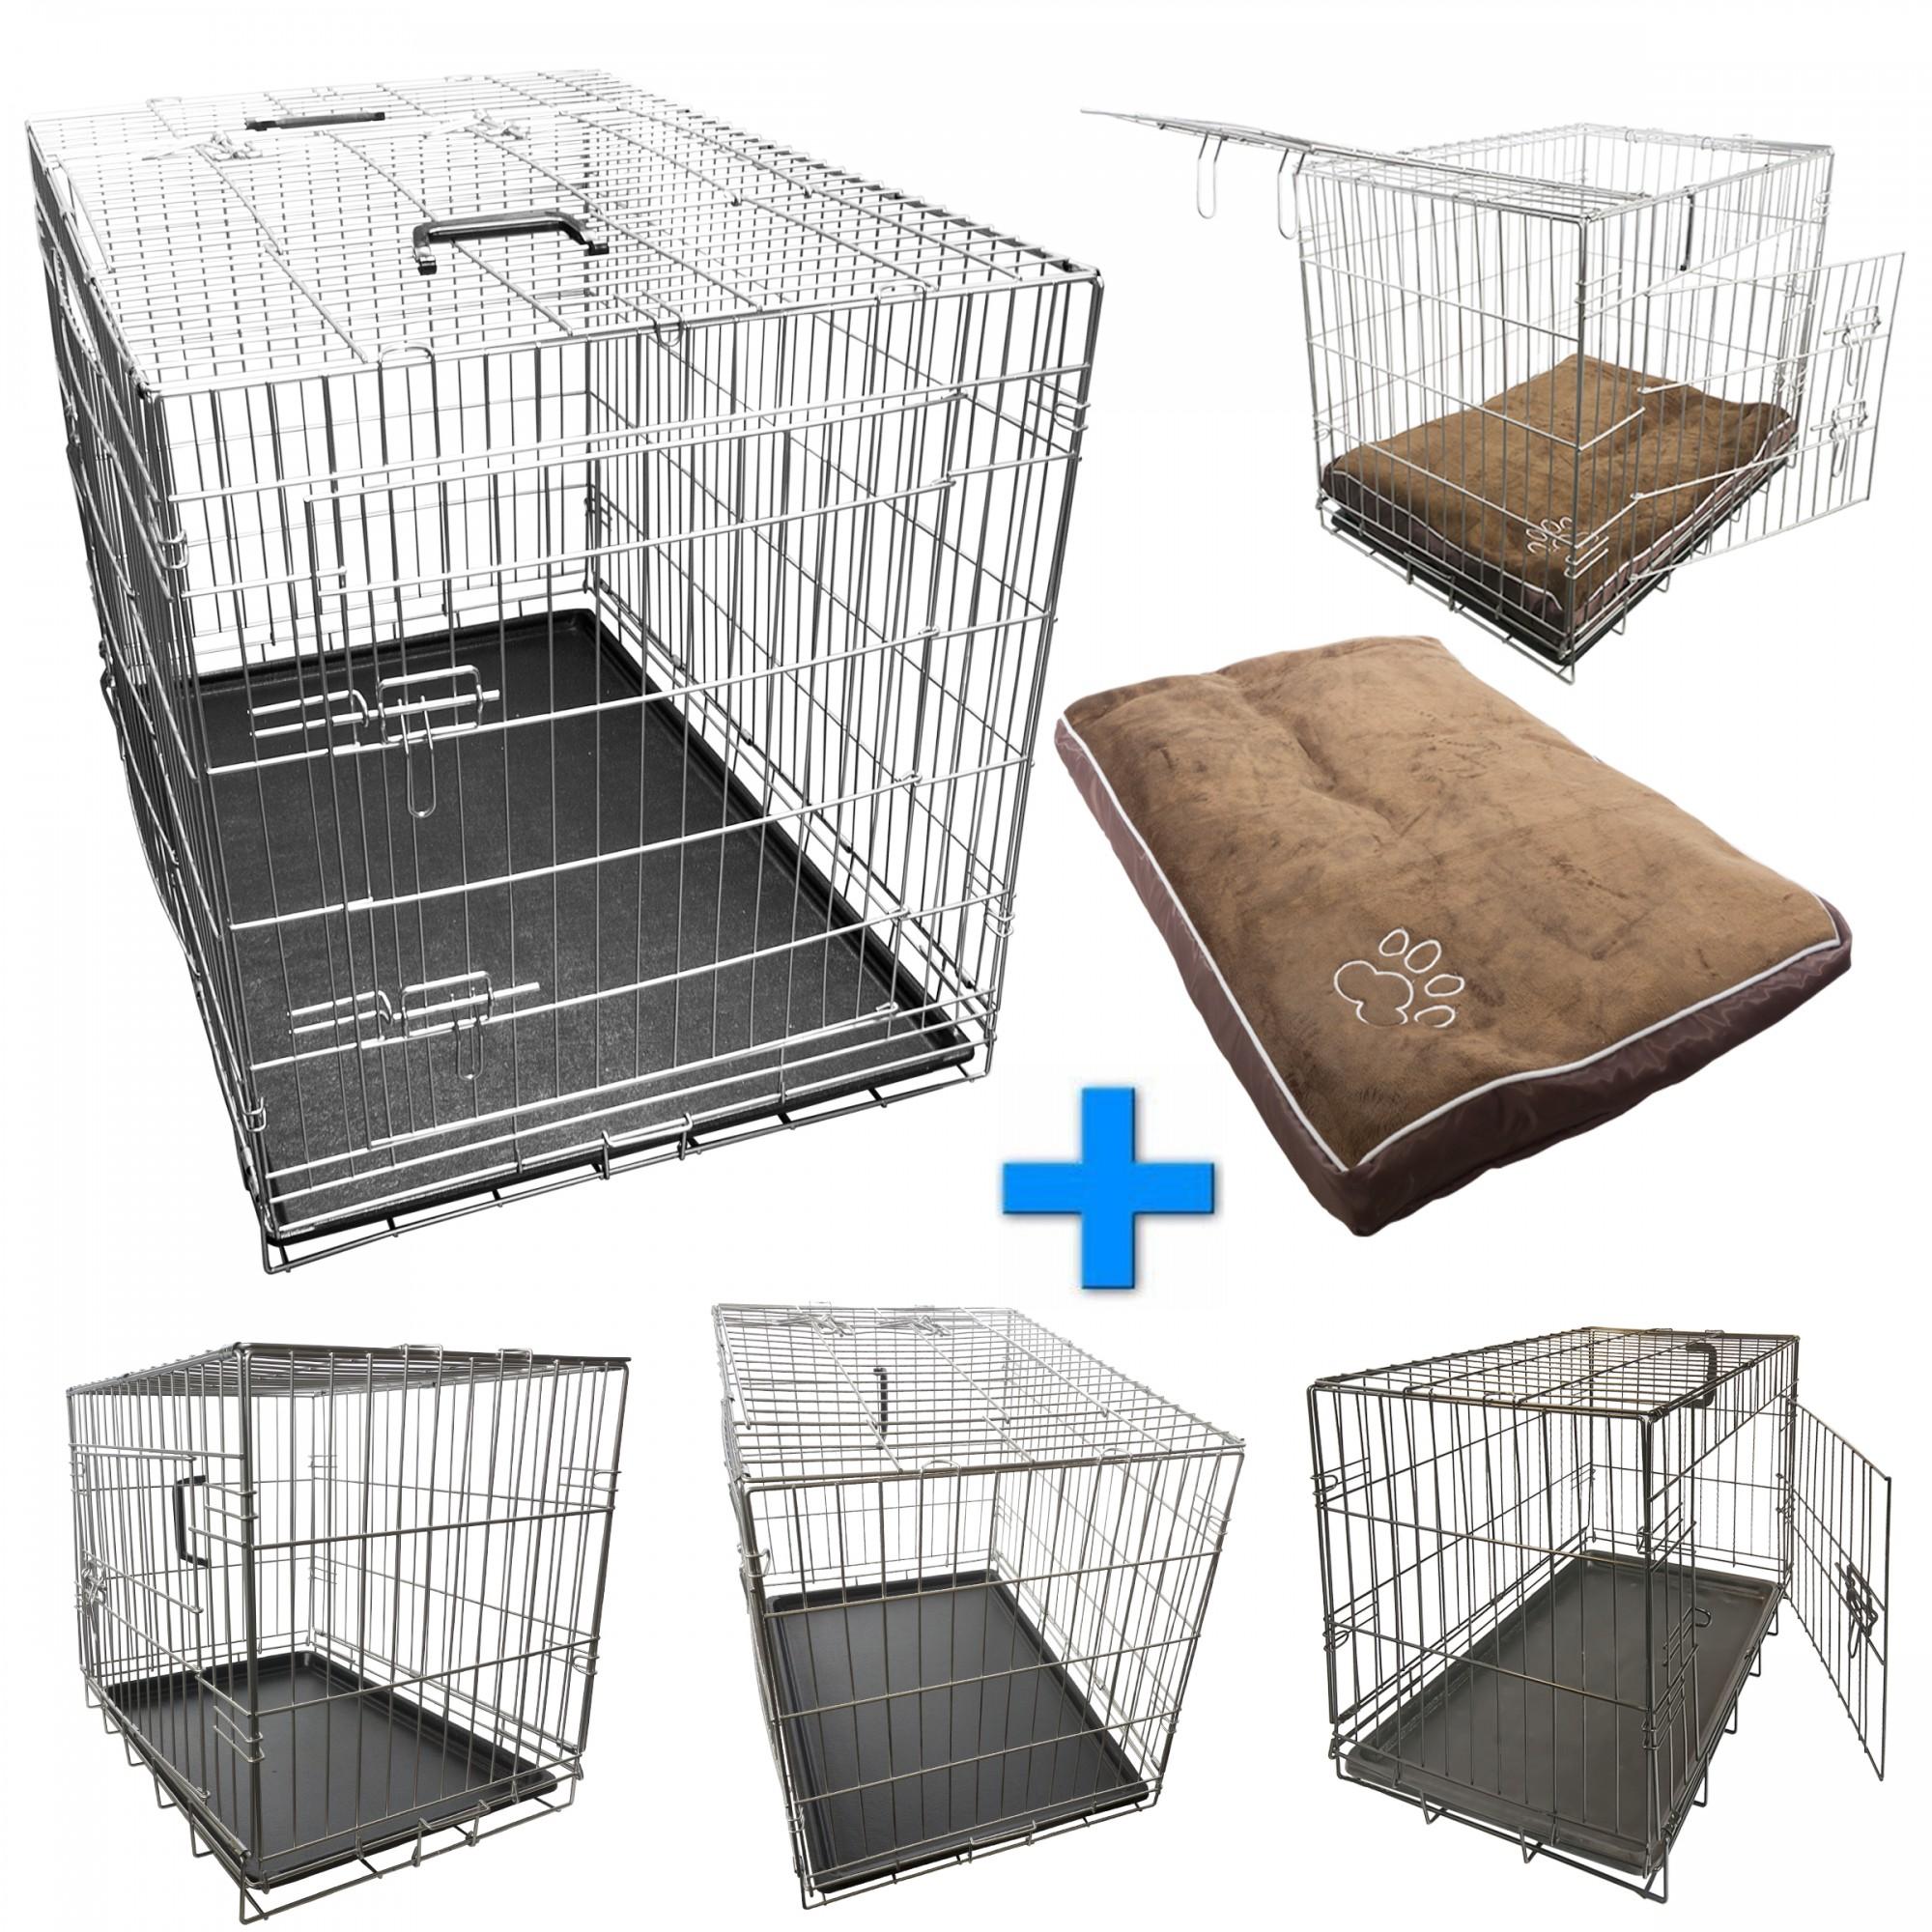 nemaxx foldable transport box transport cage wire cage dog. Black Bedroom Furniture Sets. Home Design Ideas